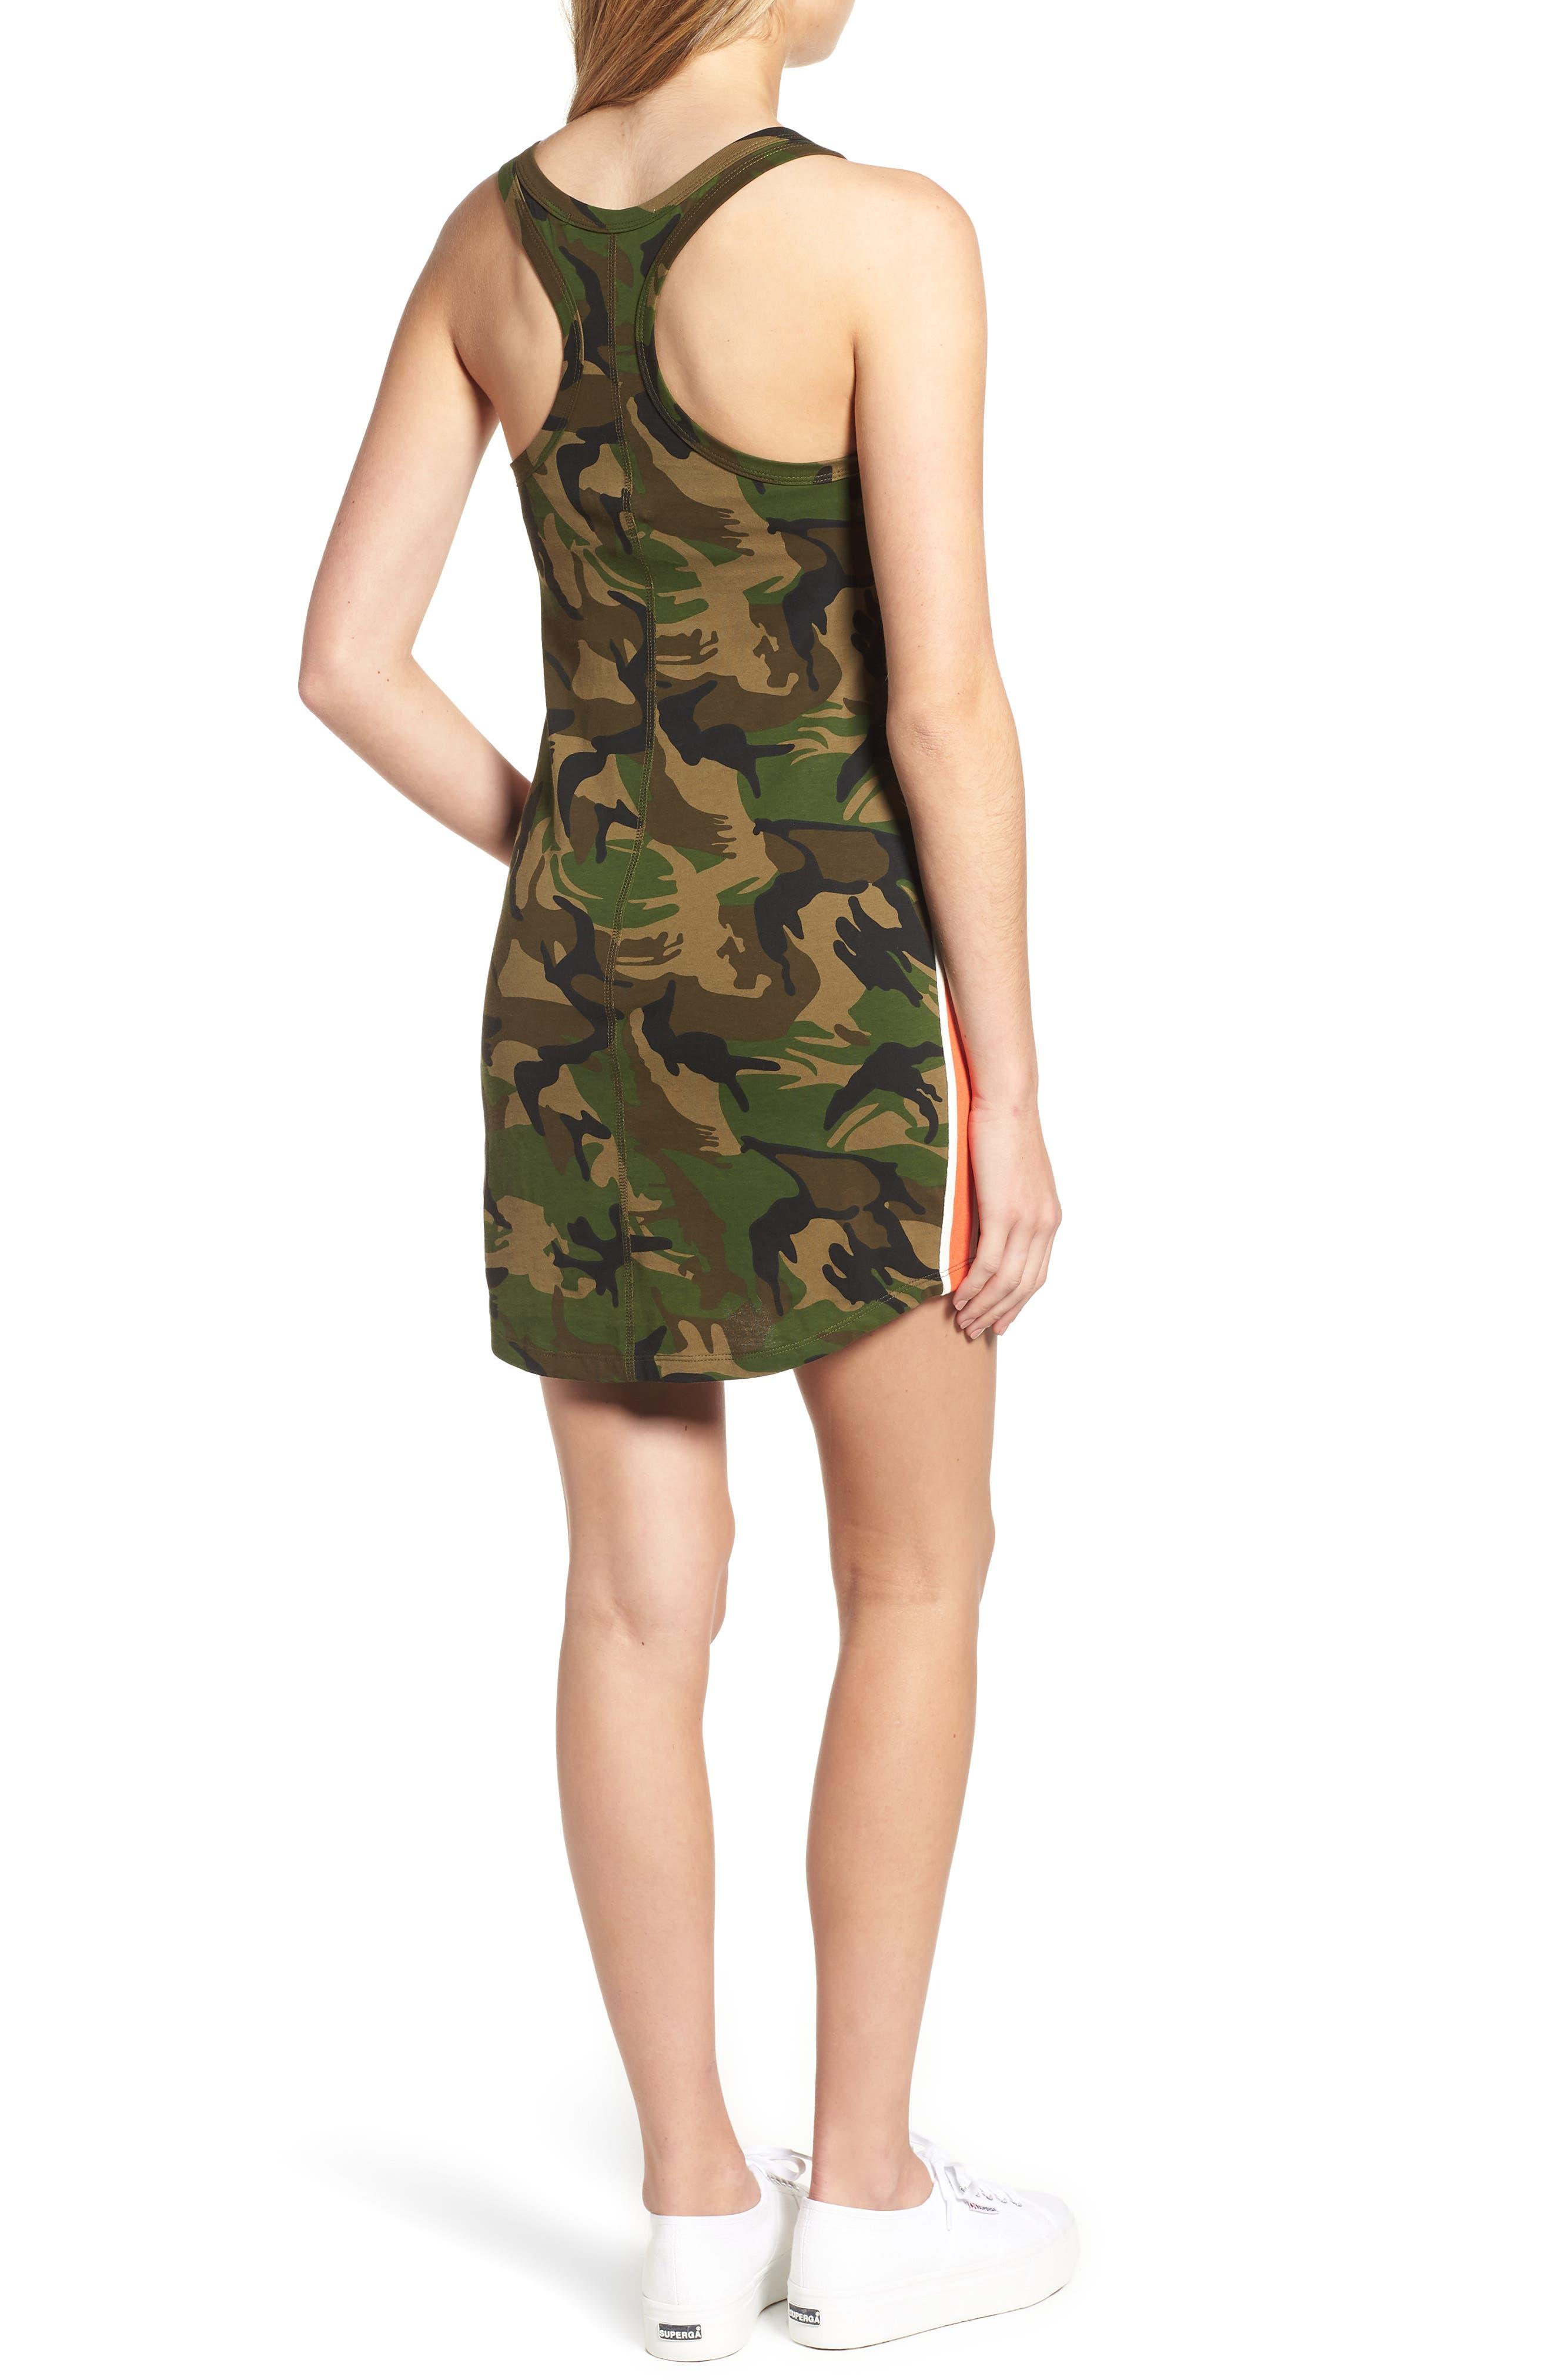 Camo Print Tank Dress,                             Alternate thumbnail 2, color,                             ARMY CAMO